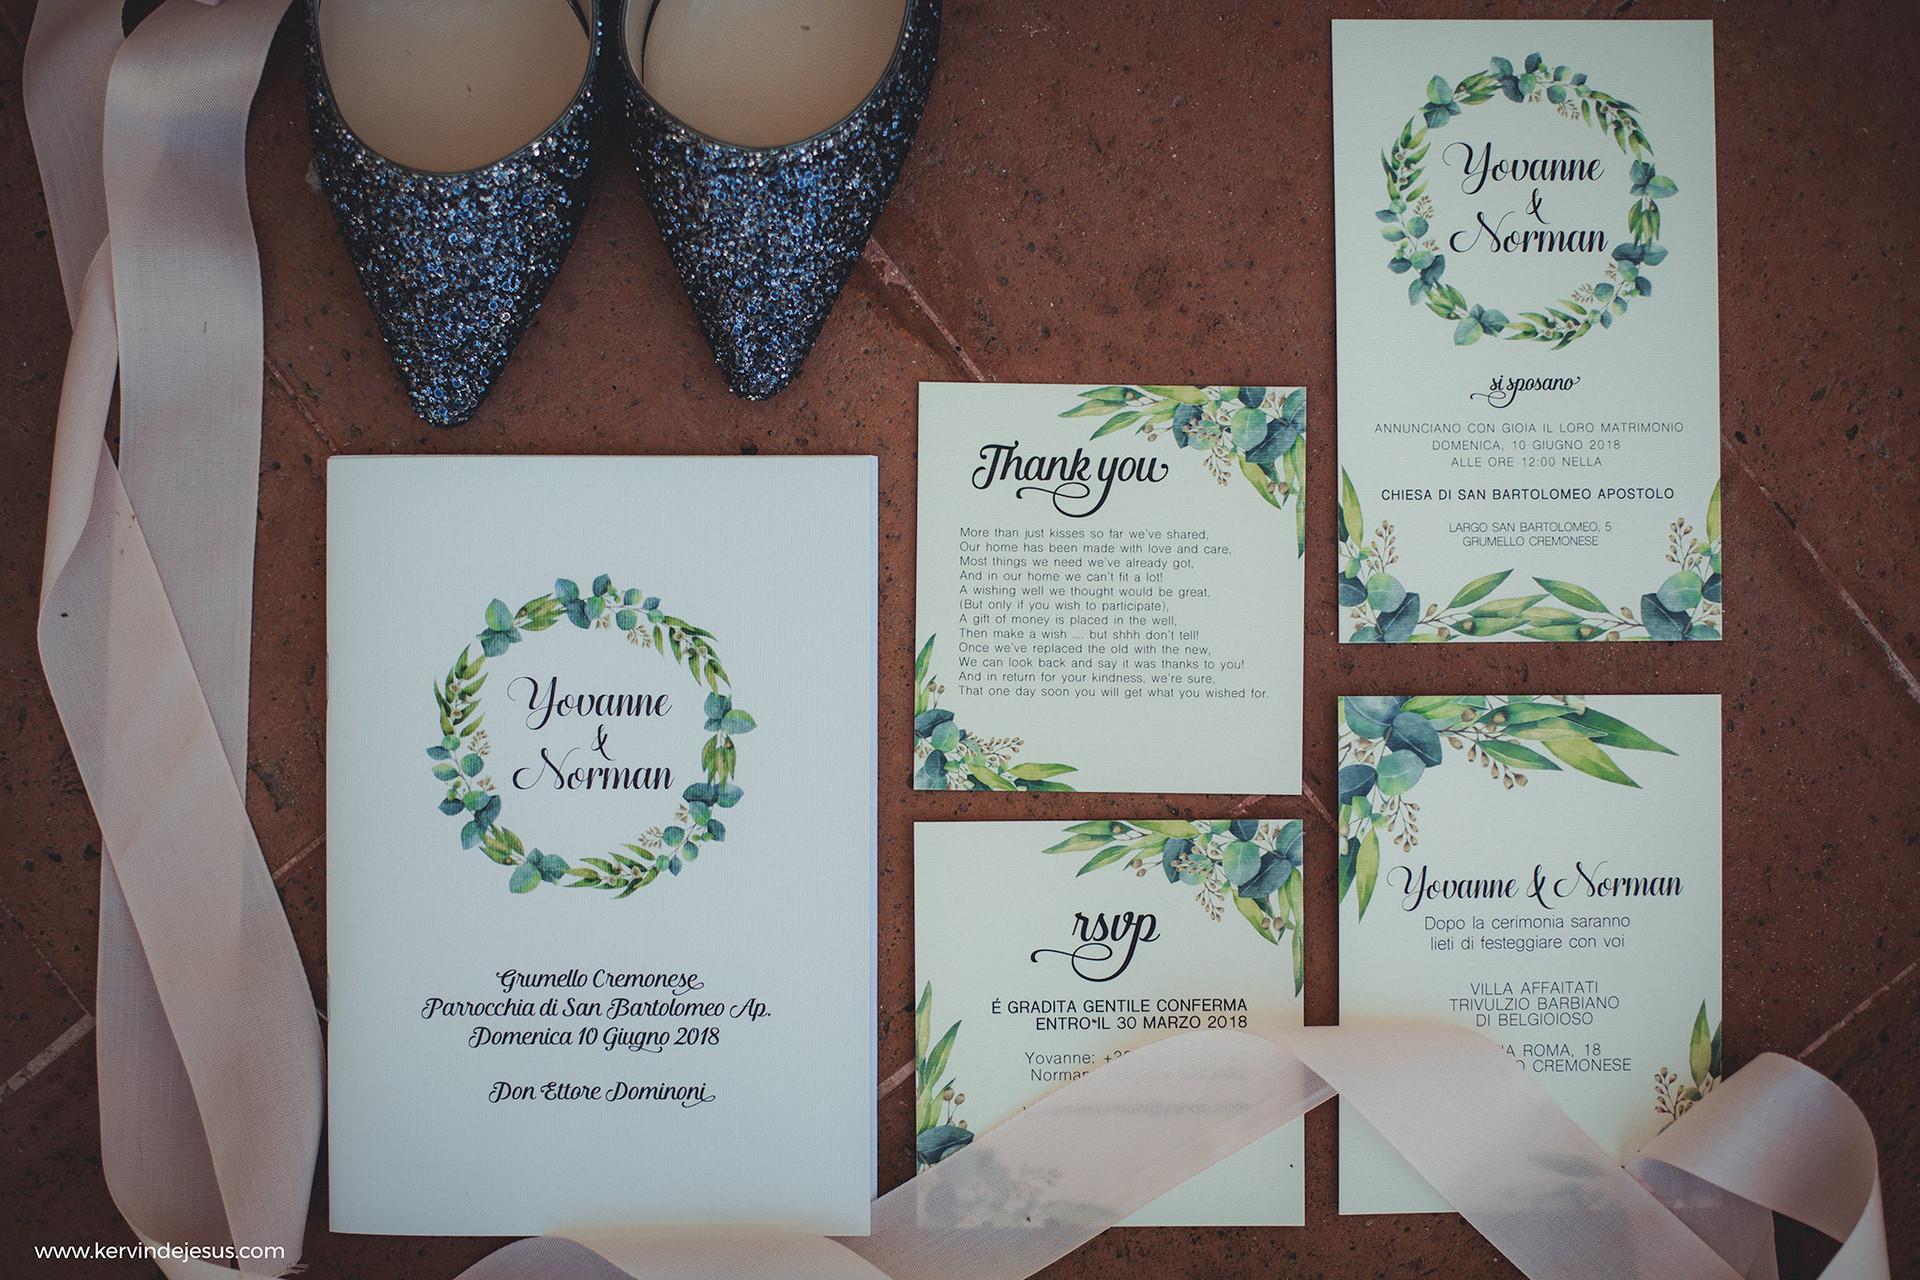 fcs_yovannenorman_wedding5.jpg